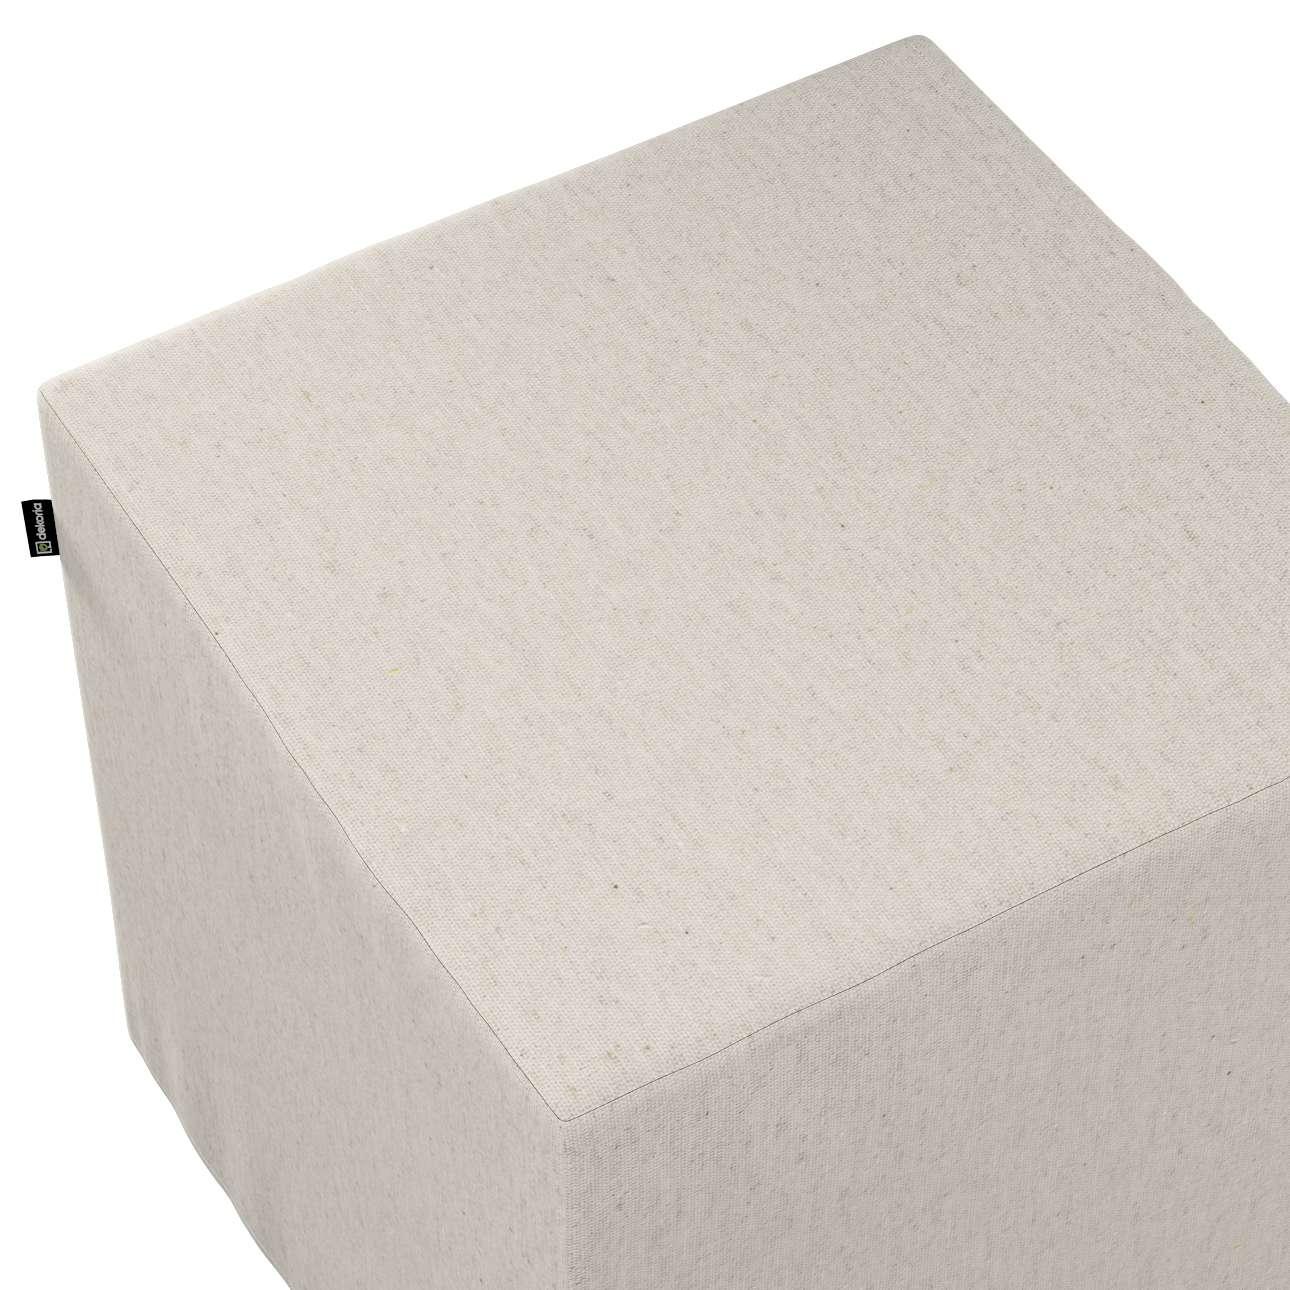 Pufa kostka w kolekcji Loneta, tkanina: 133-65